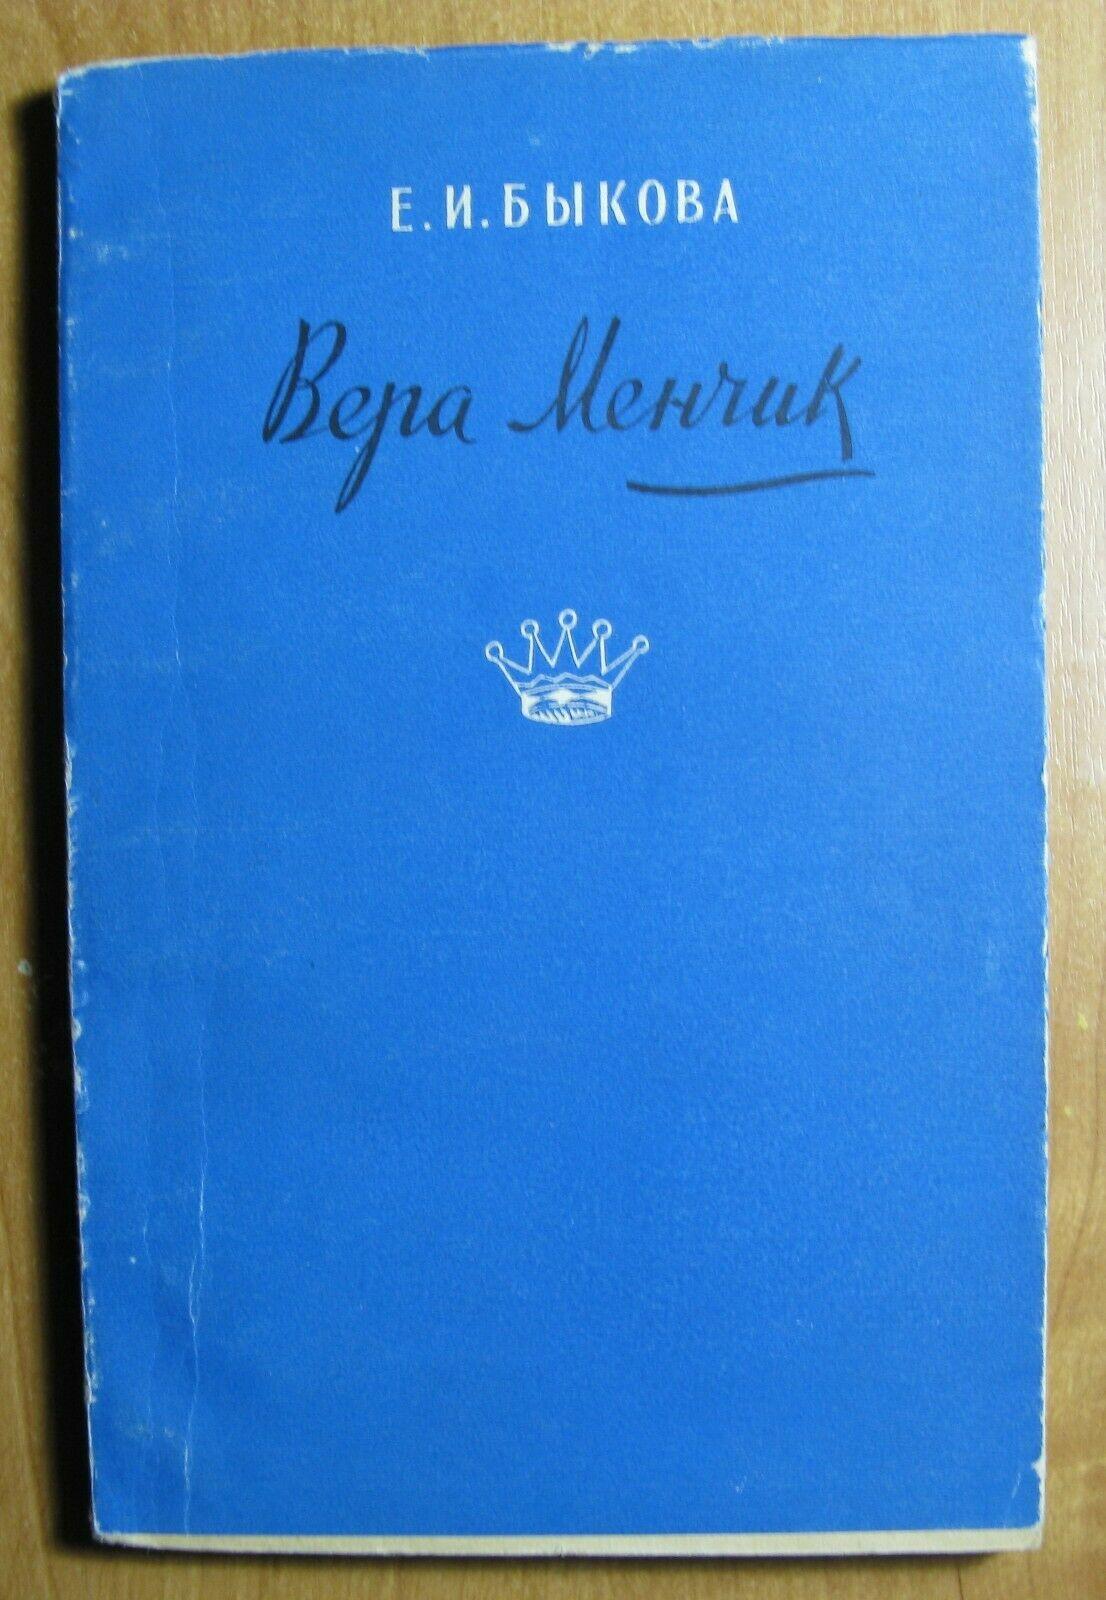 Vera Menchik., EI Bykova, Moscow, 1957, 176 pages, 4s 7d.